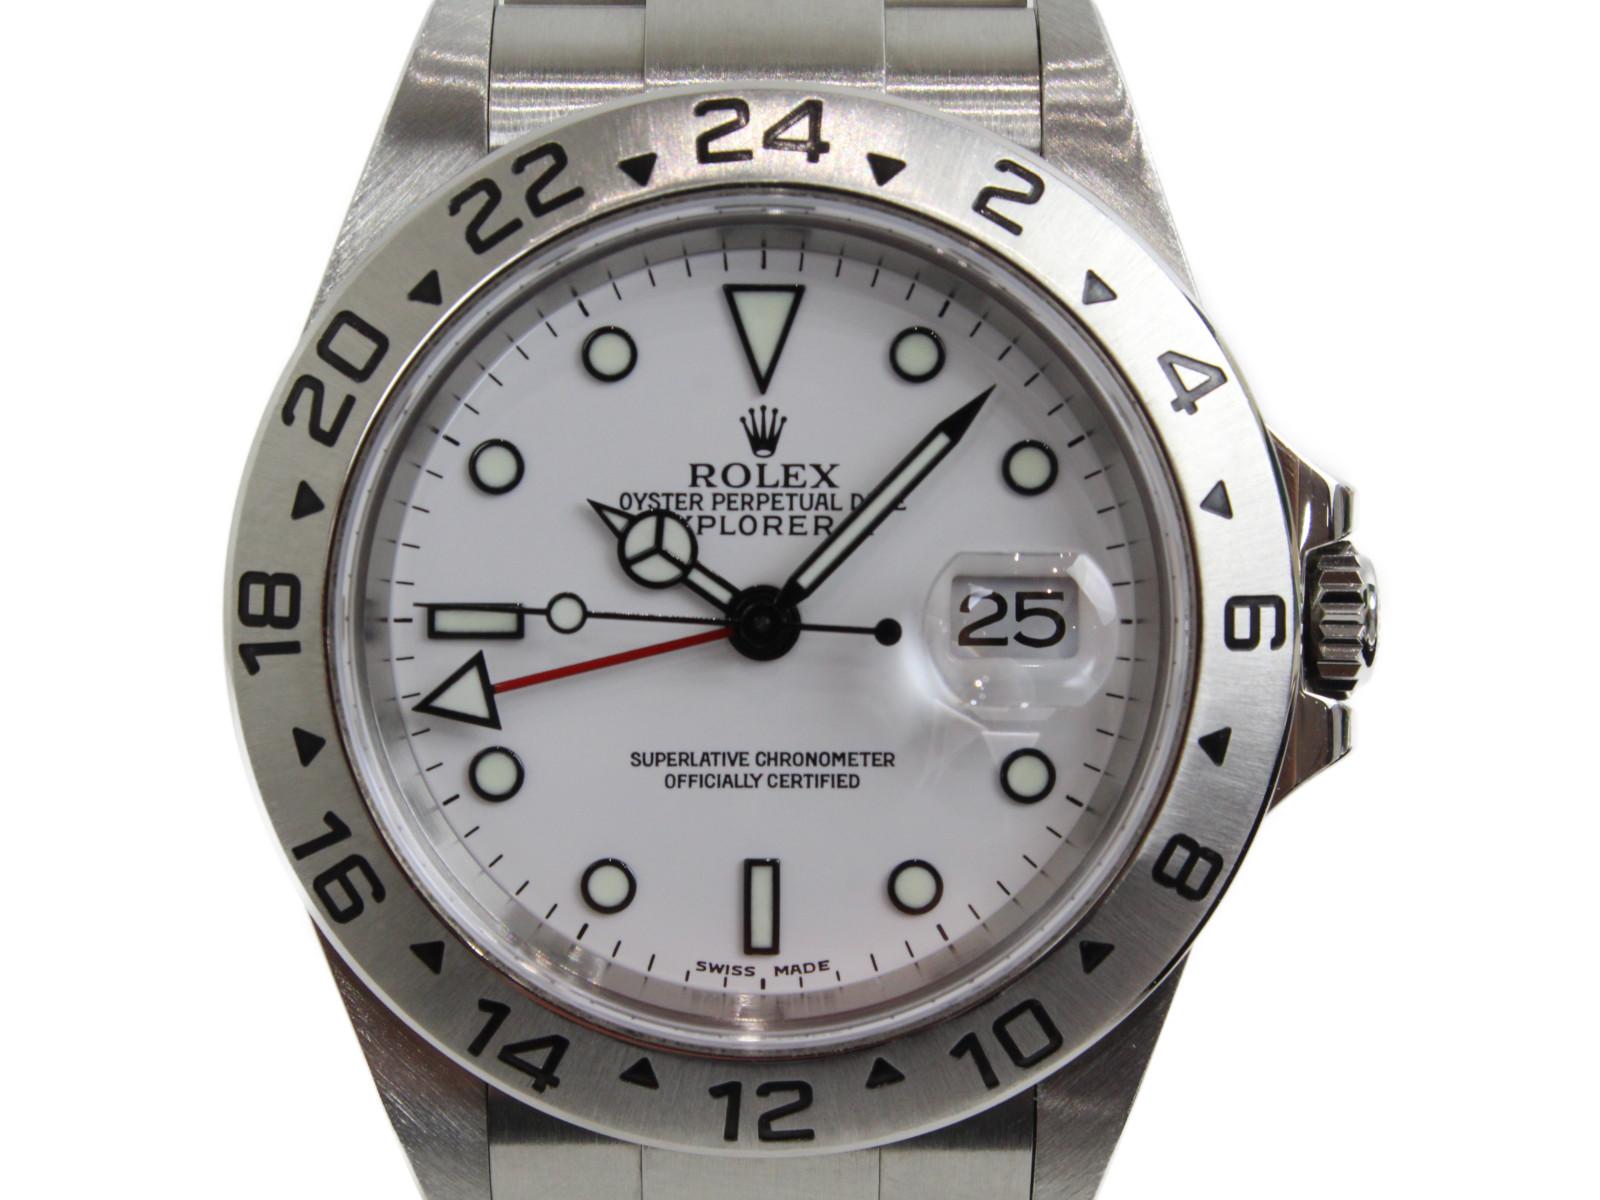 ROLEX ロレックス エクスプローラーII 16570 Y番 2003年 自動巻き GMT SS ホワイト メンズ 腕時計【中古】